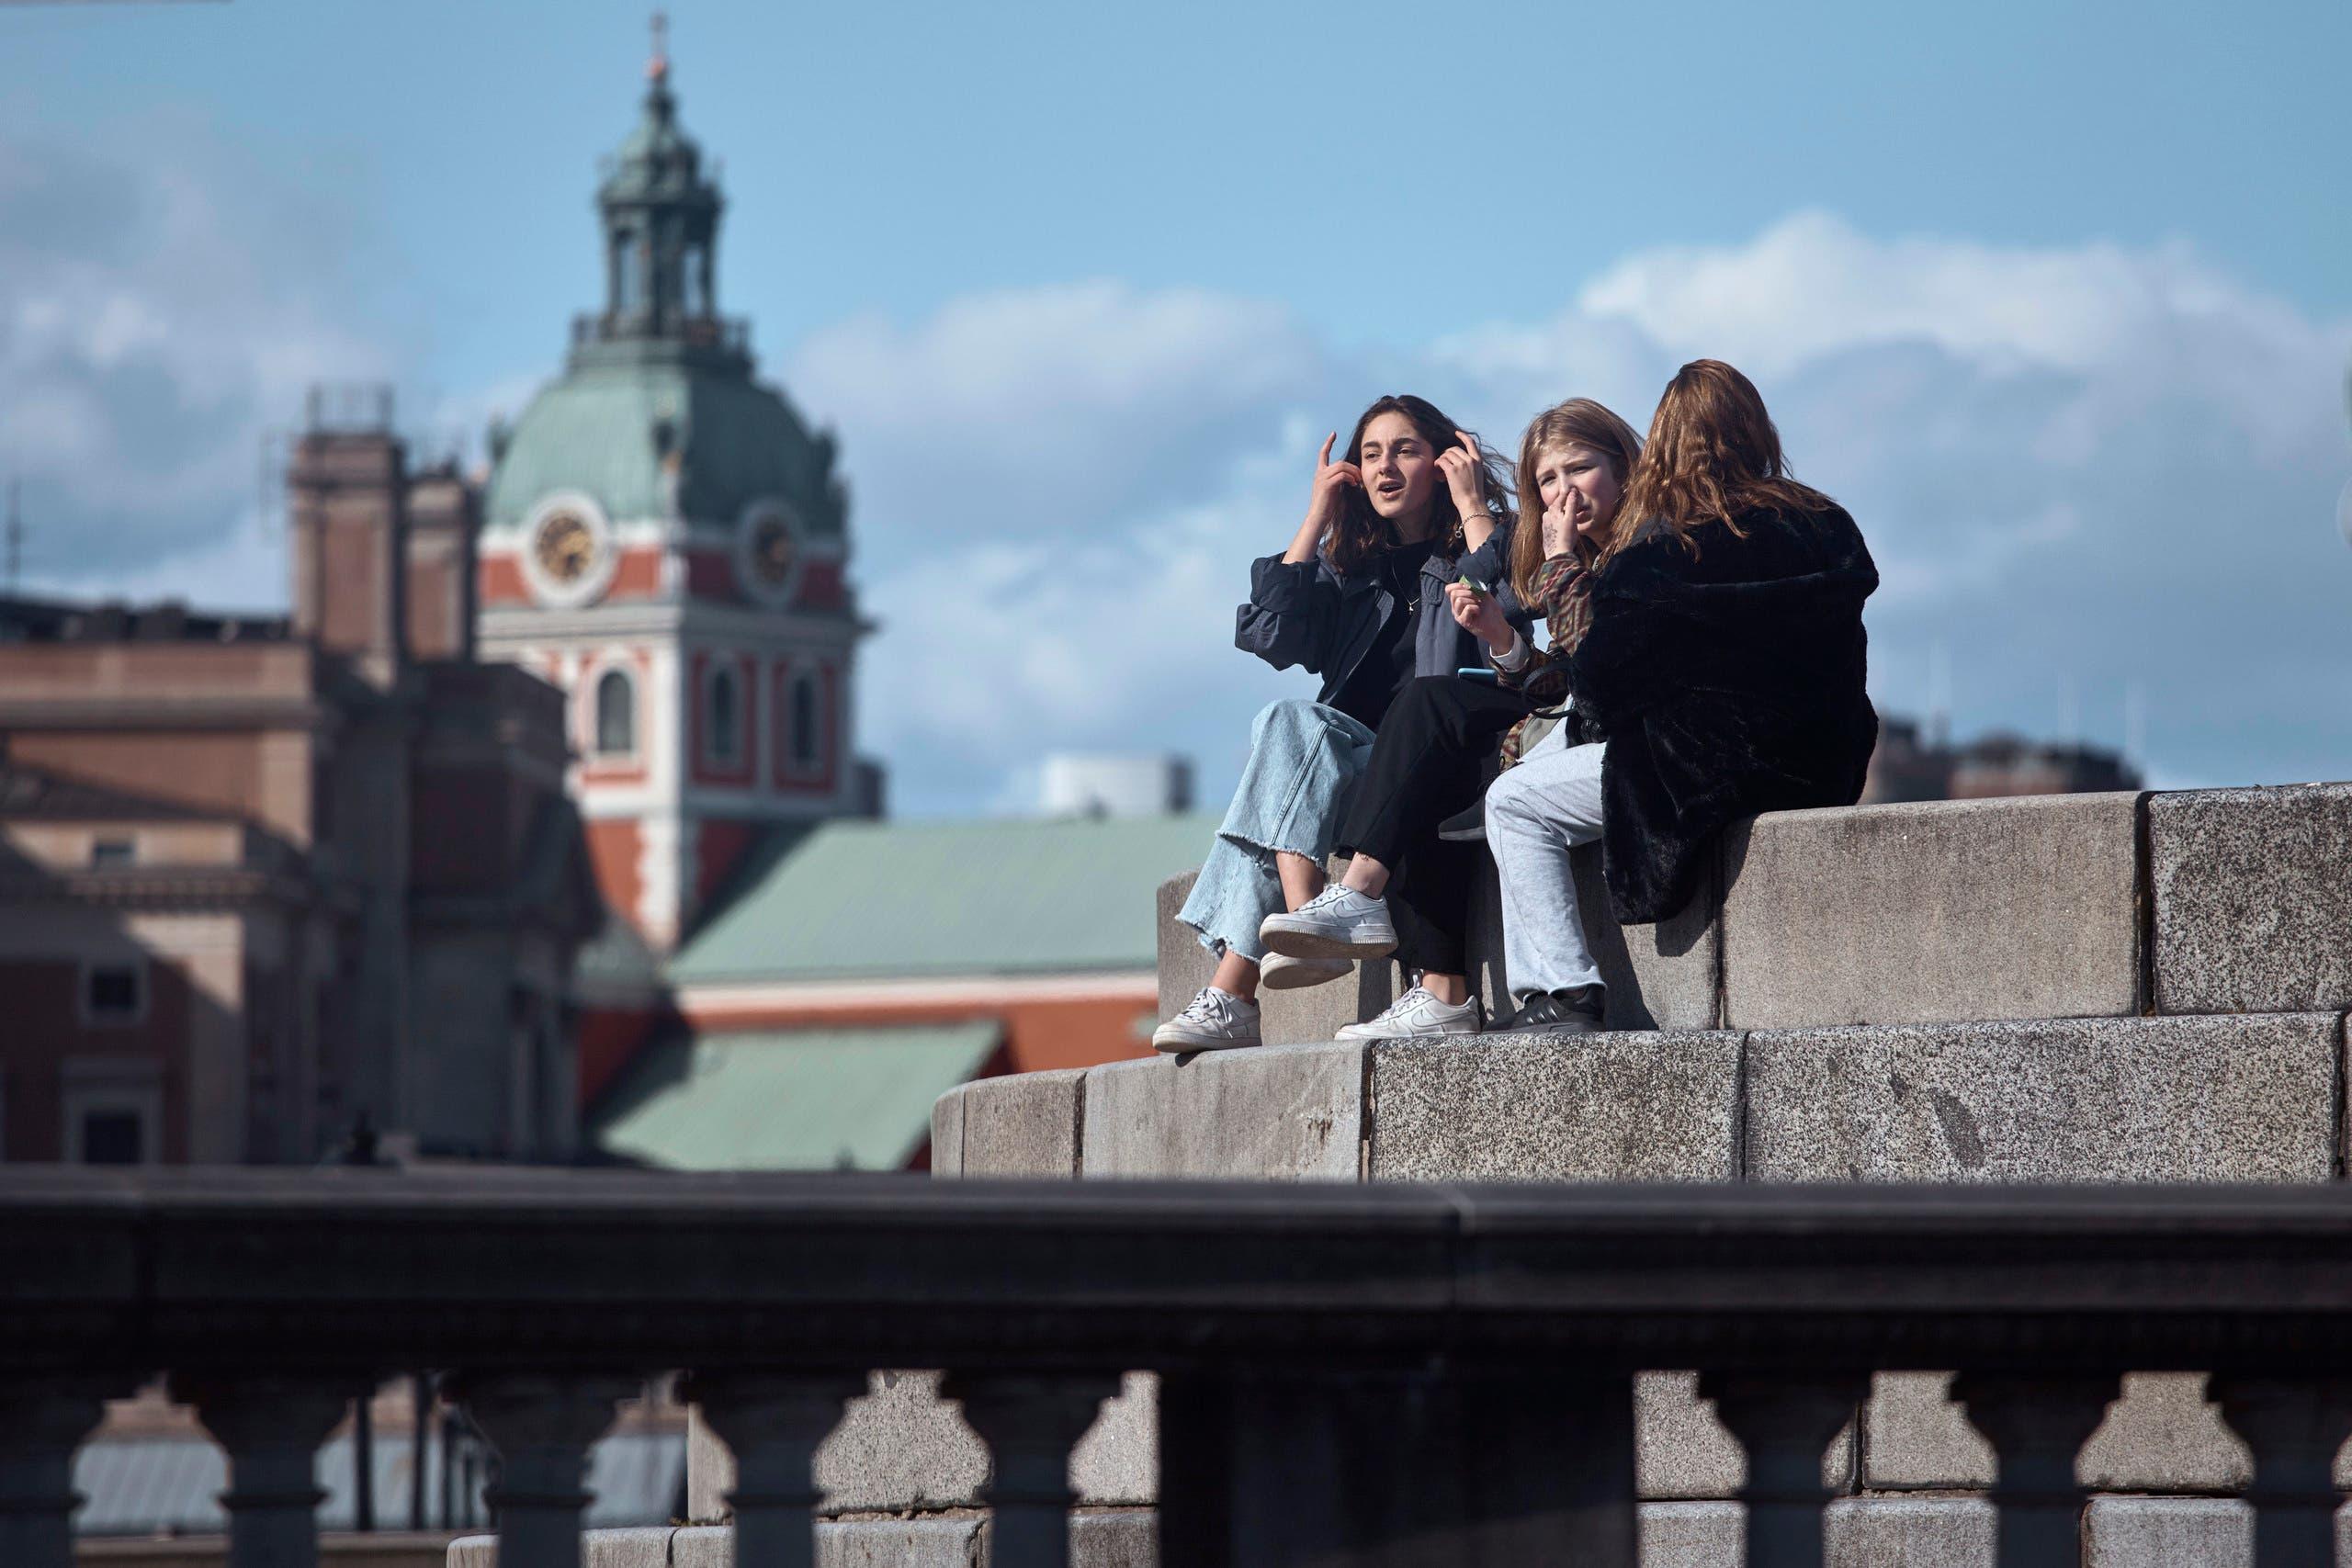 Young people socialise together in Stockholm, Sweden, Saturday, April 4, 2020. (AP)